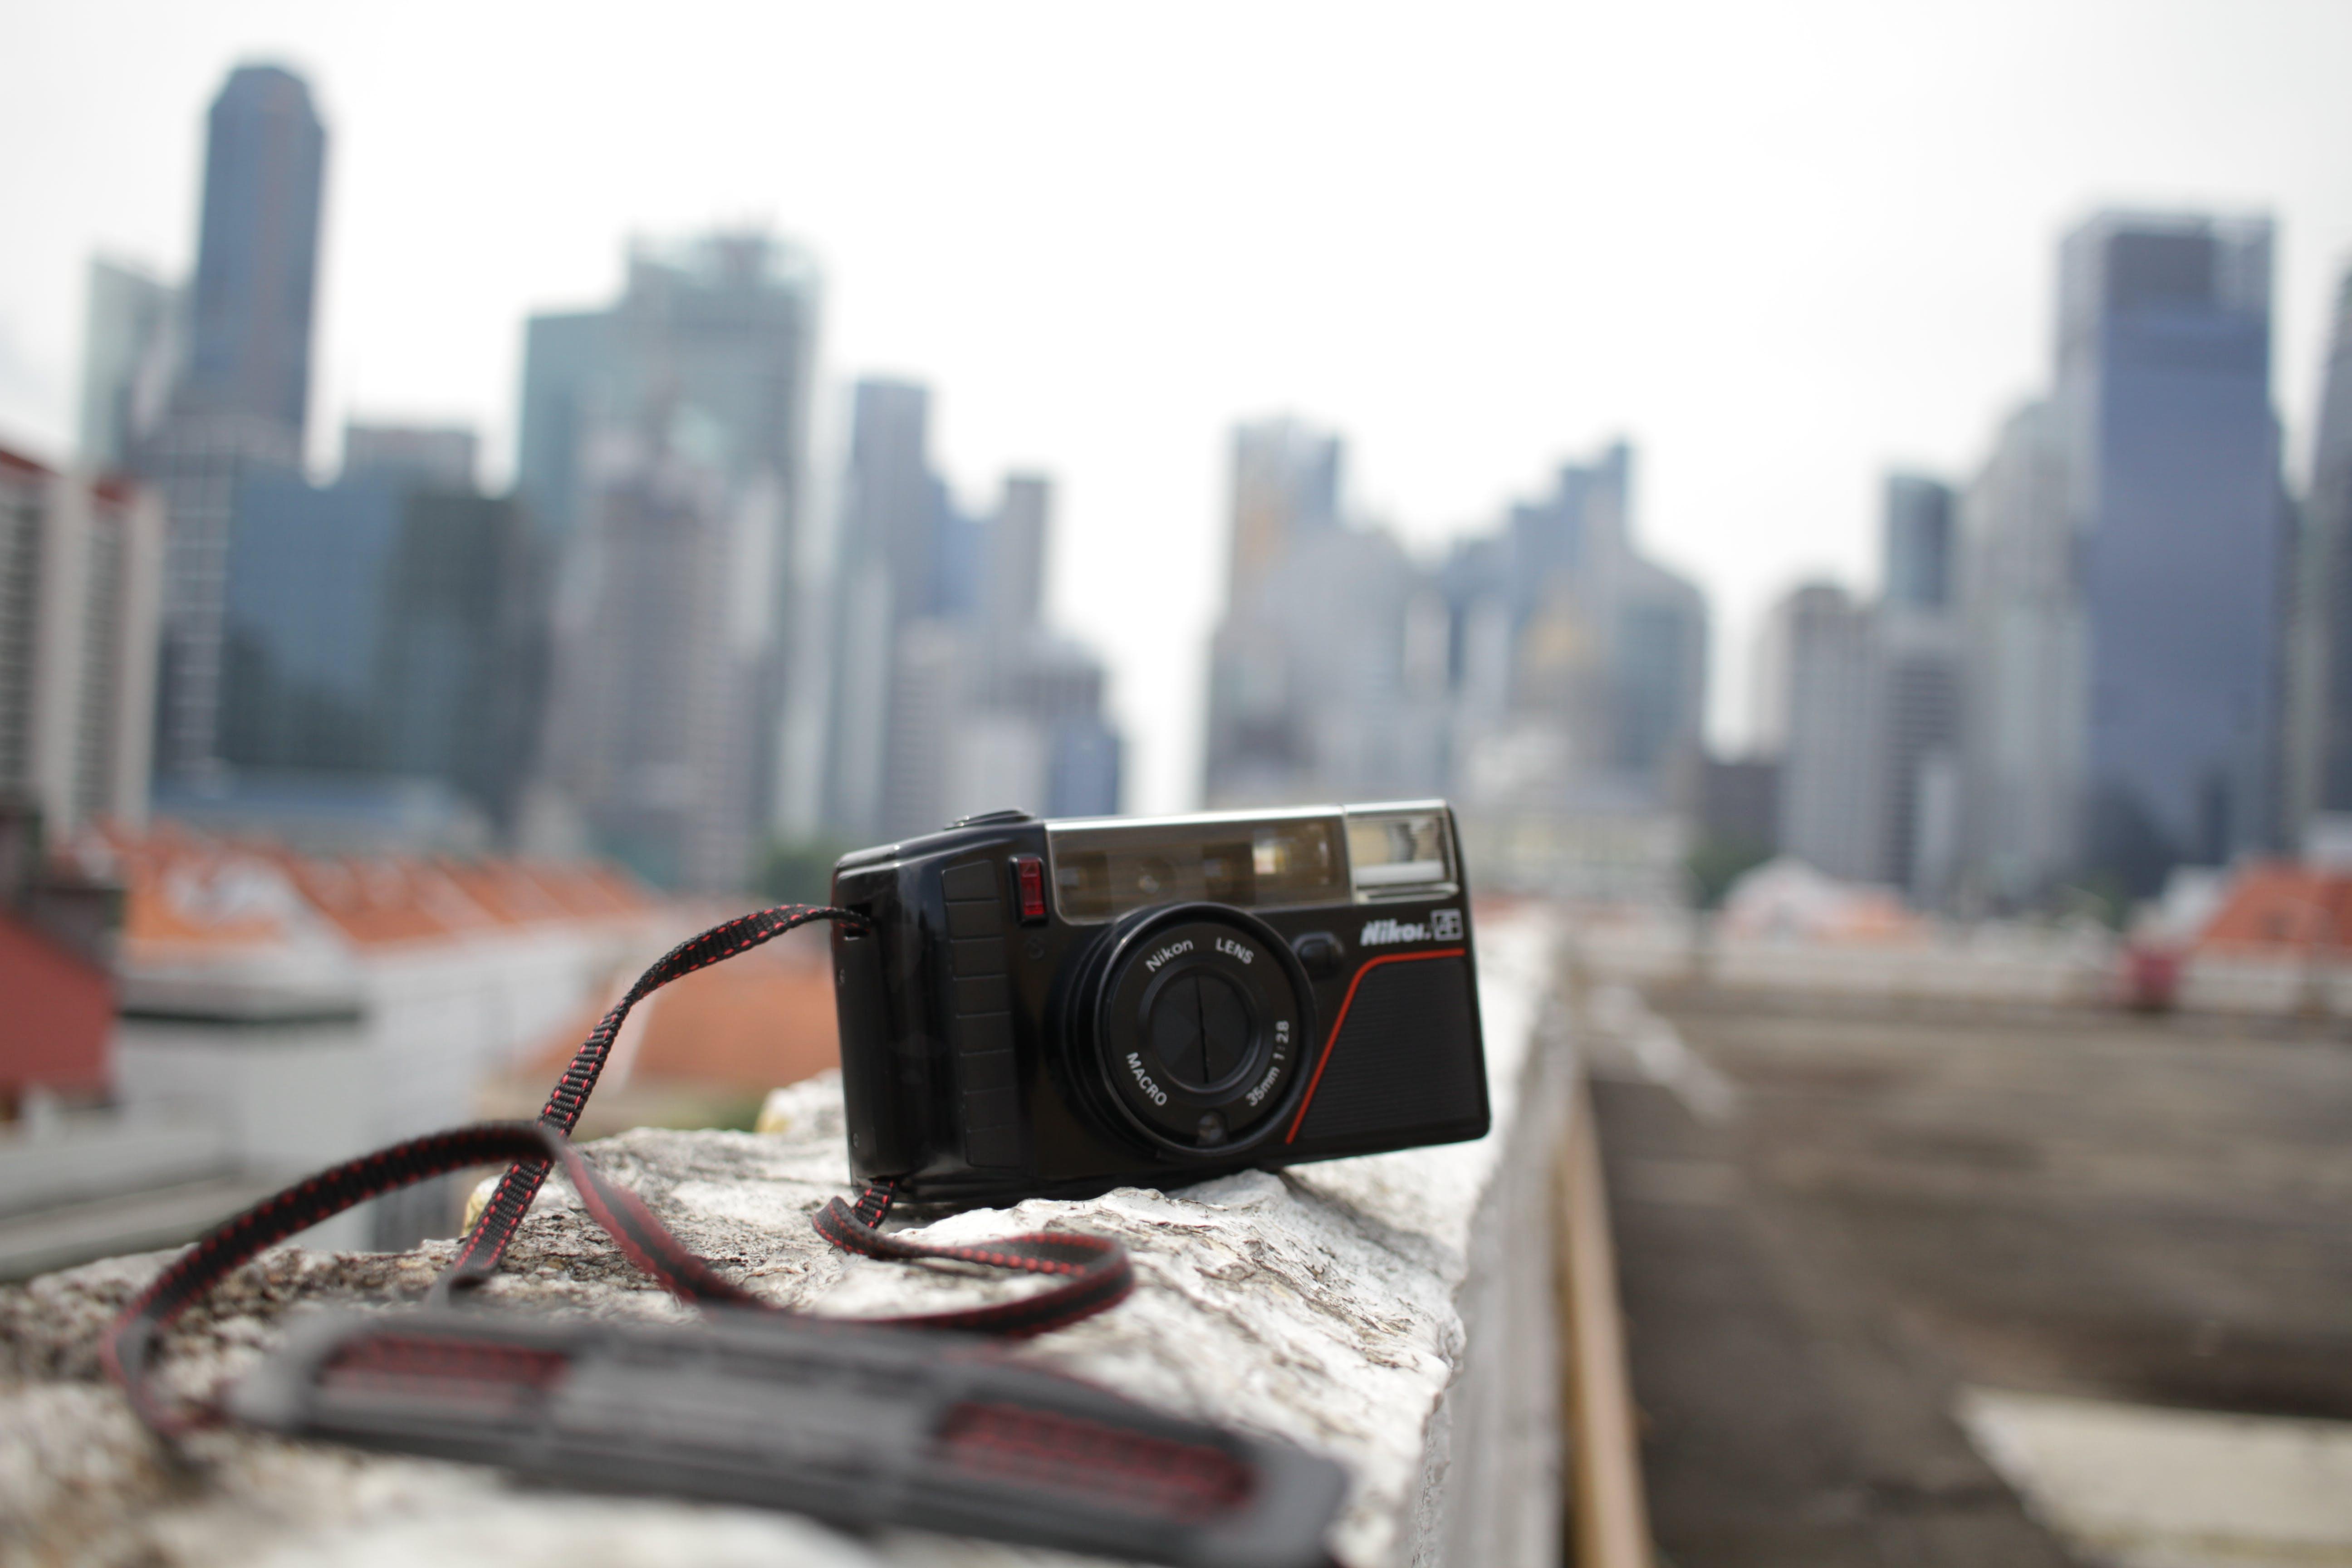 Free stock photo of camera, nikon, nikon camera